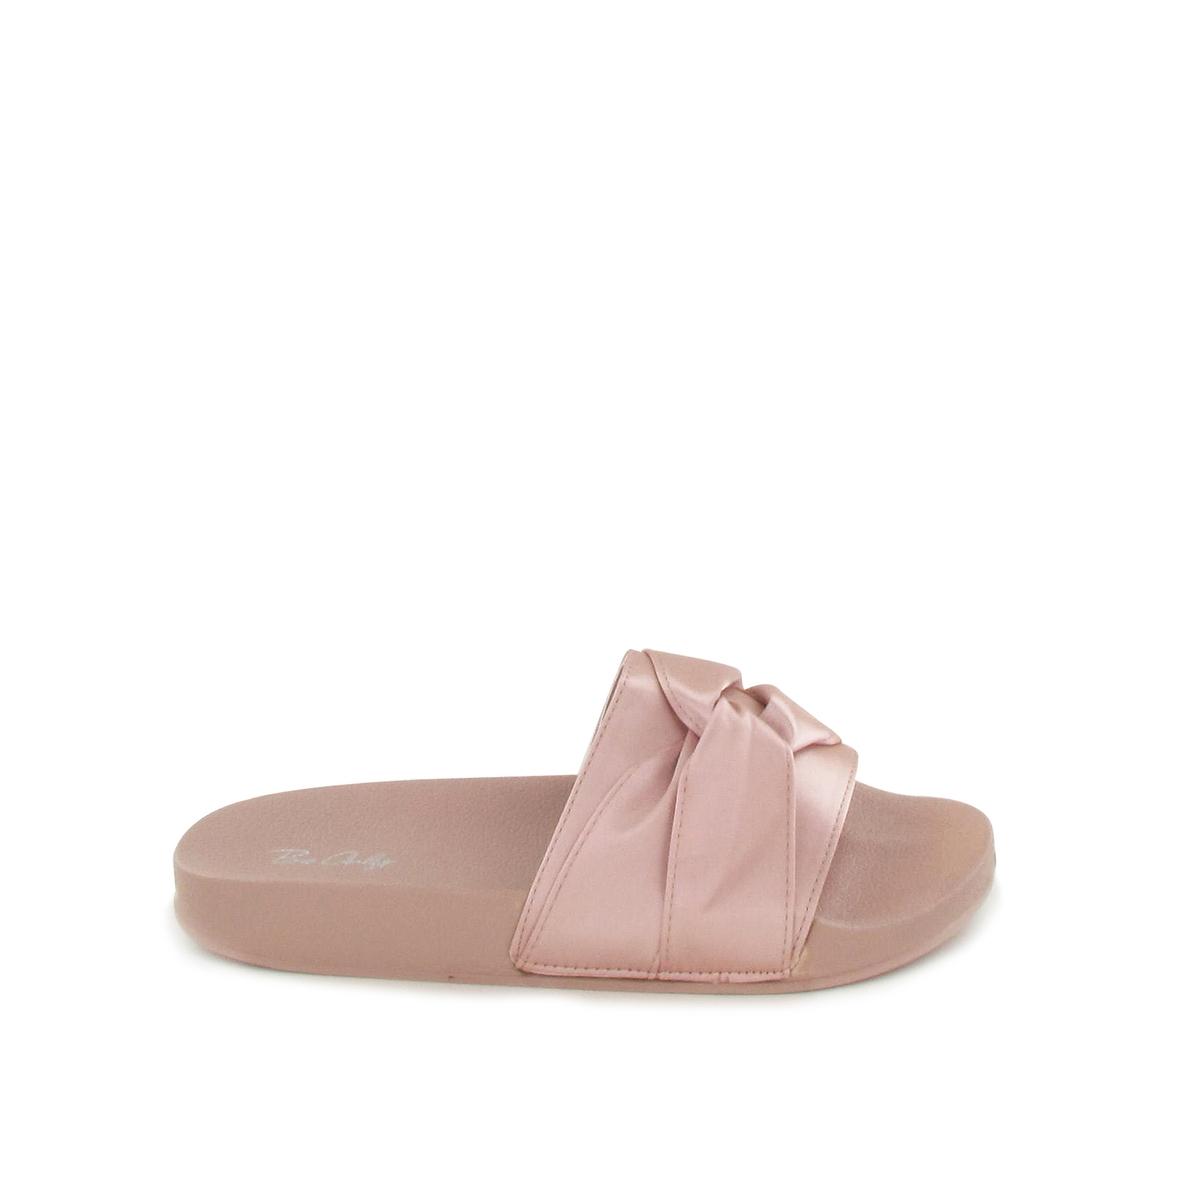 Вьетнамки LaRedoute — Fanny 37 розовый